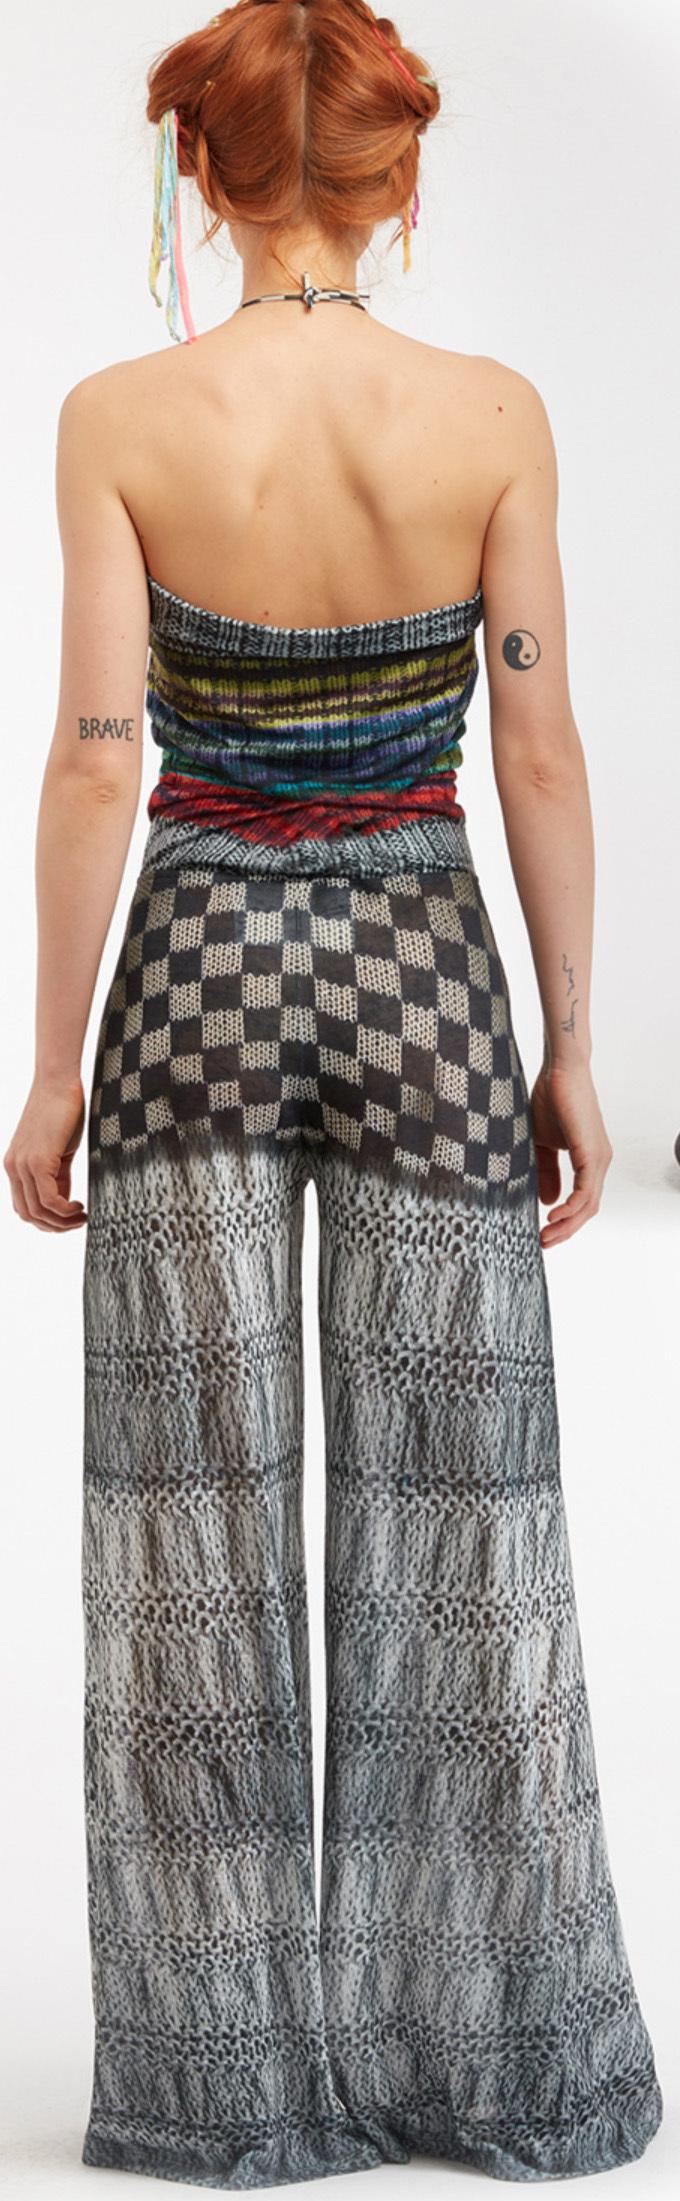 IPNG: Destructive Denim & Knit Illusion Grand Familia Jumpsuit (Converts to overalls!)